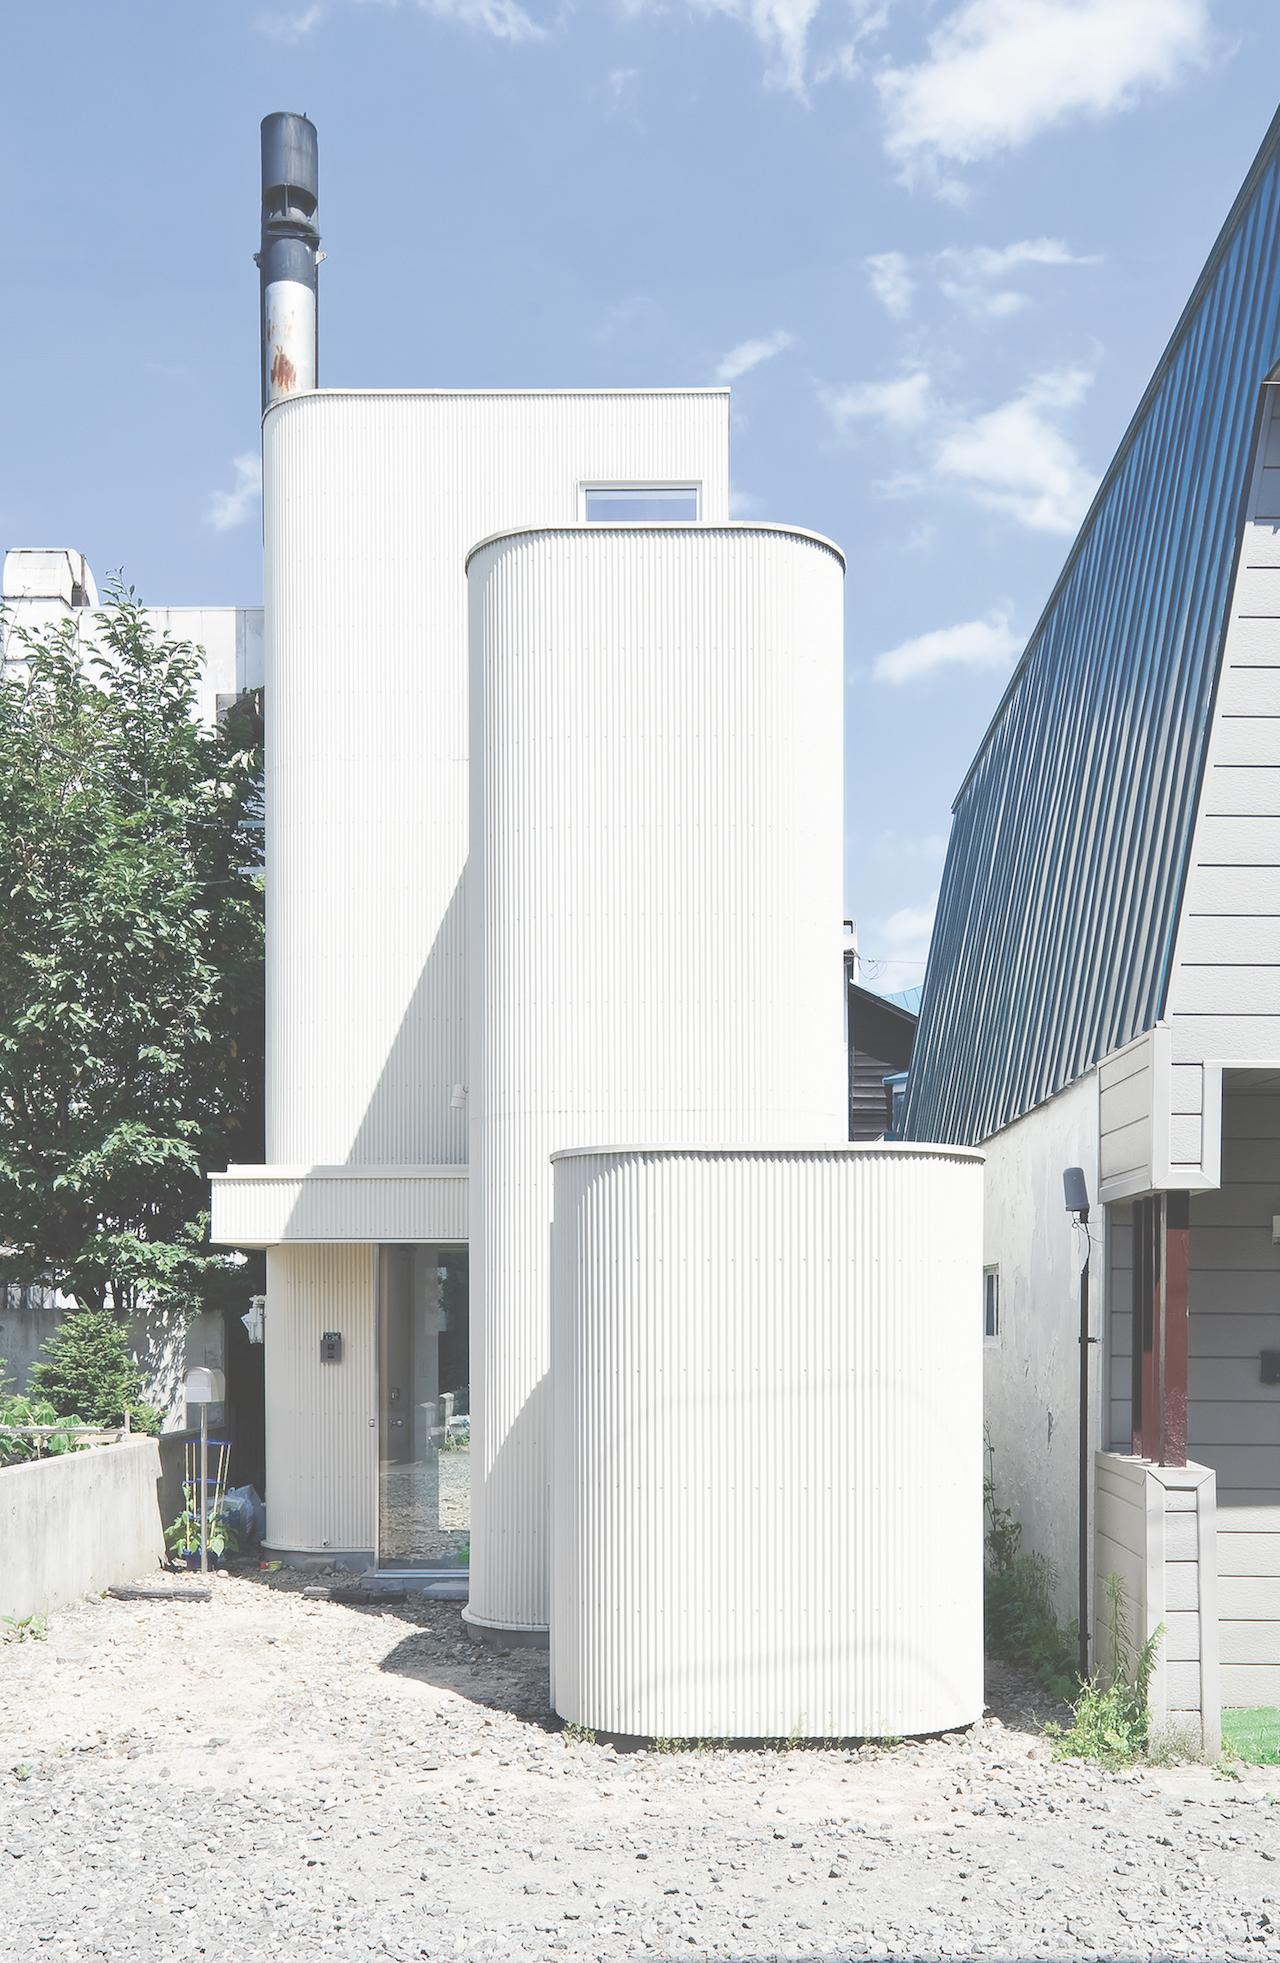 House Of Density 2013 By Jun Igarashi In Sapporo Hokkaido Prefecture